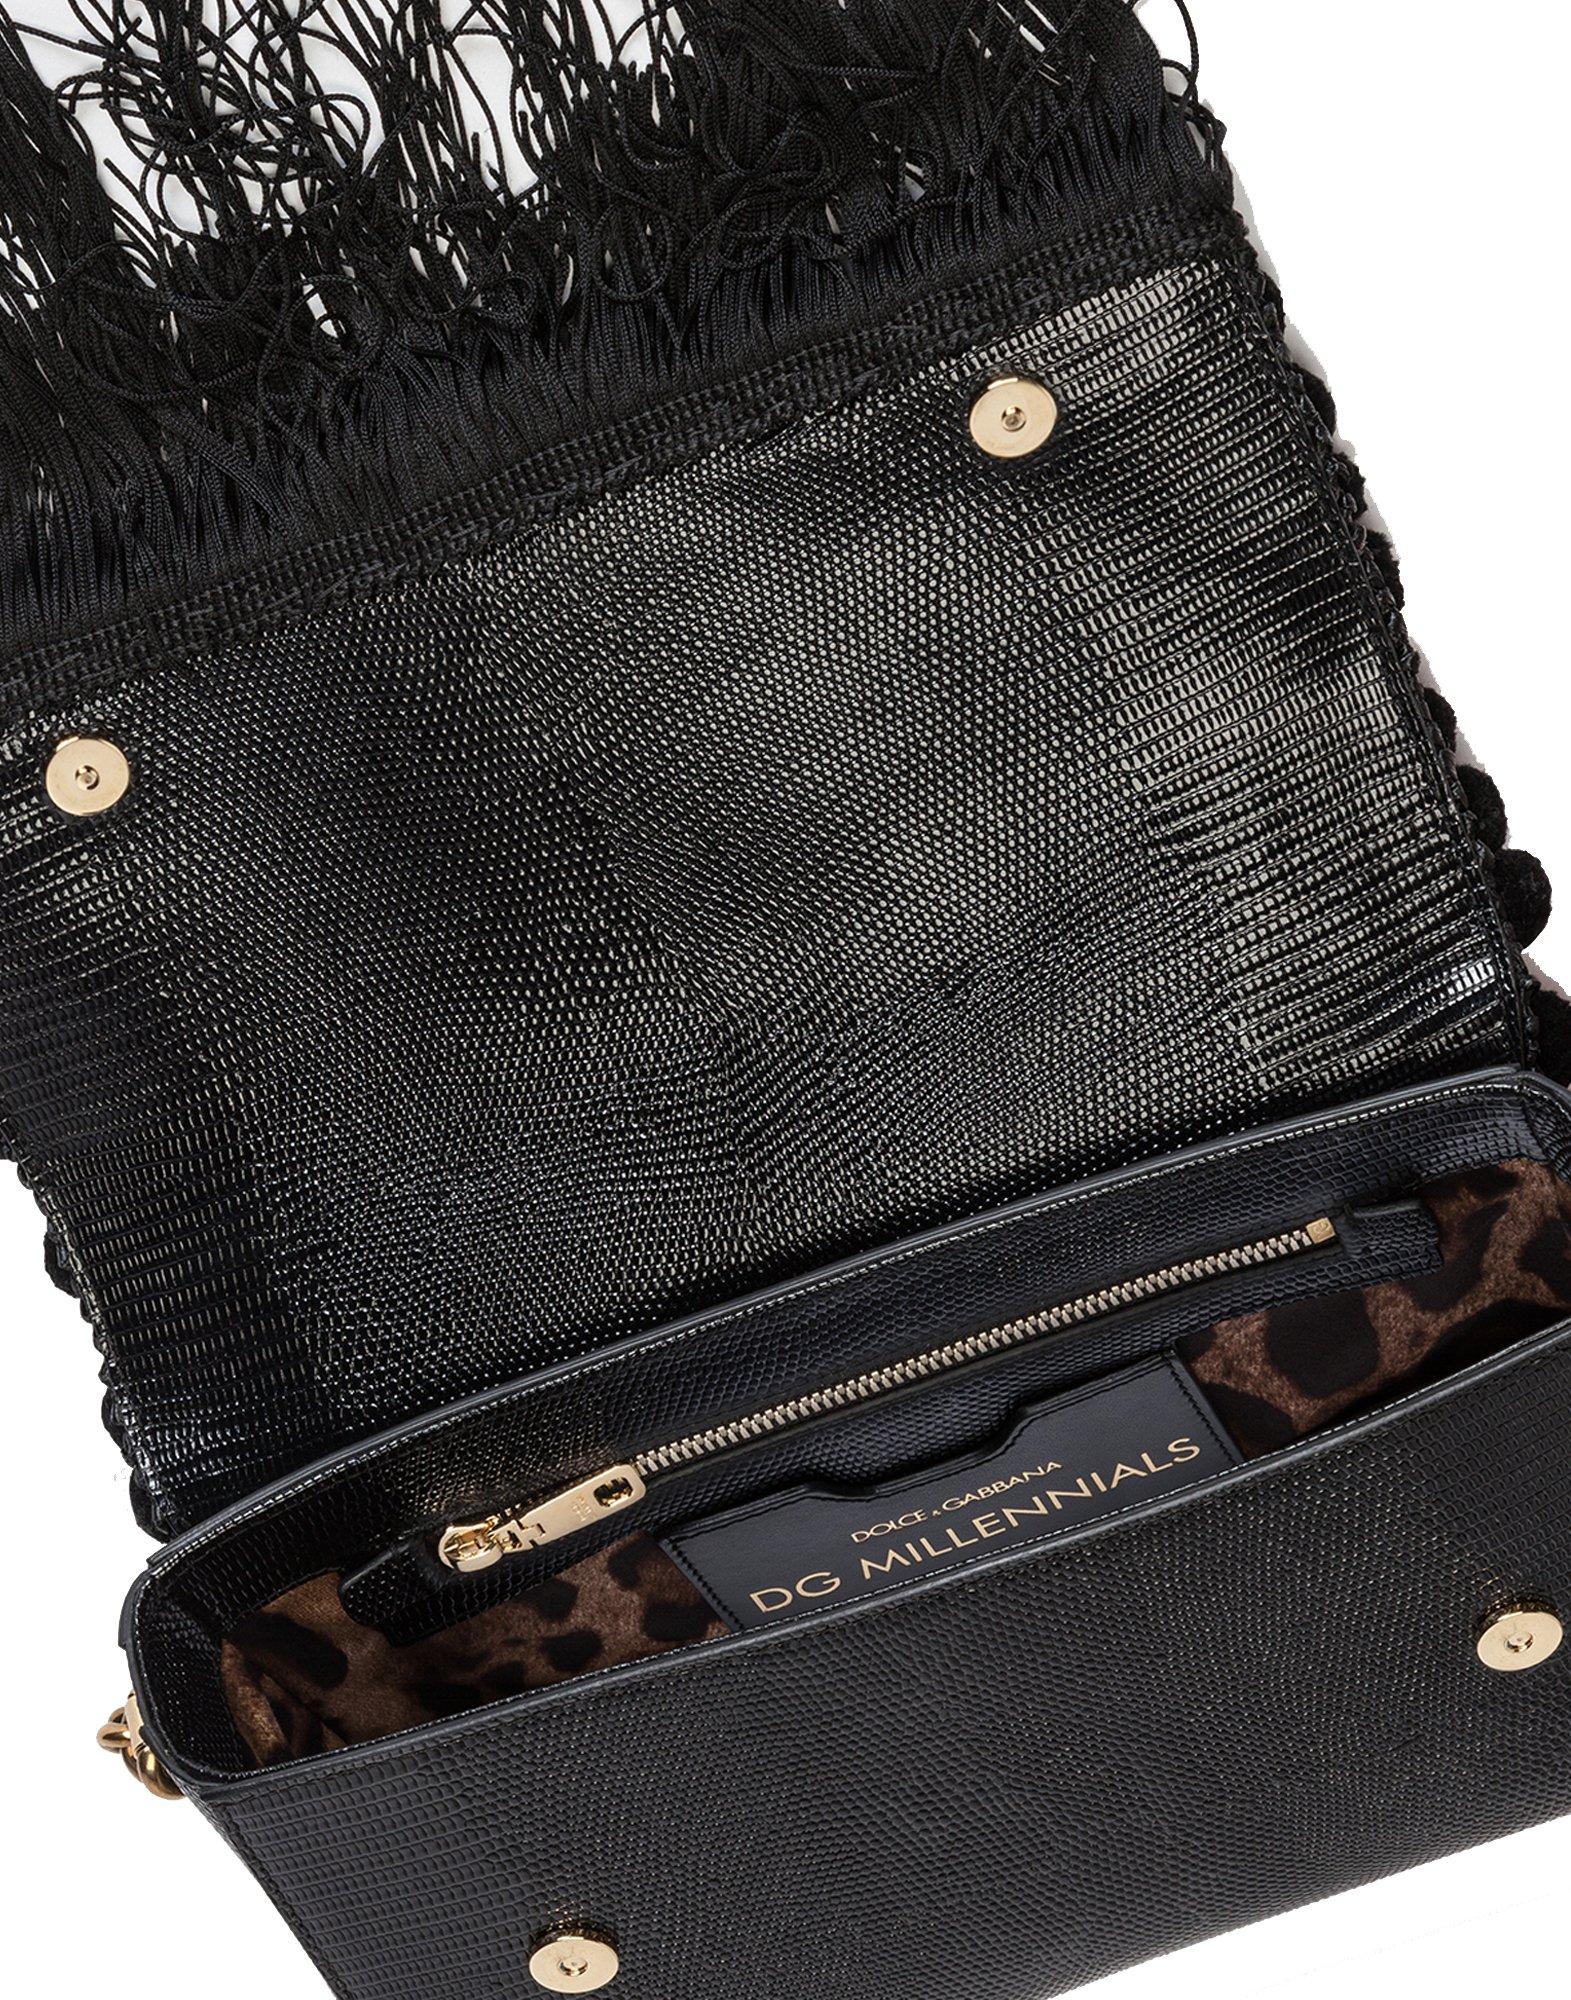 Dolce E Gabbana Women's Bb6393as9038b956 Black Leather Shoulder Bag by Dolce e Gabbana (Image #4)